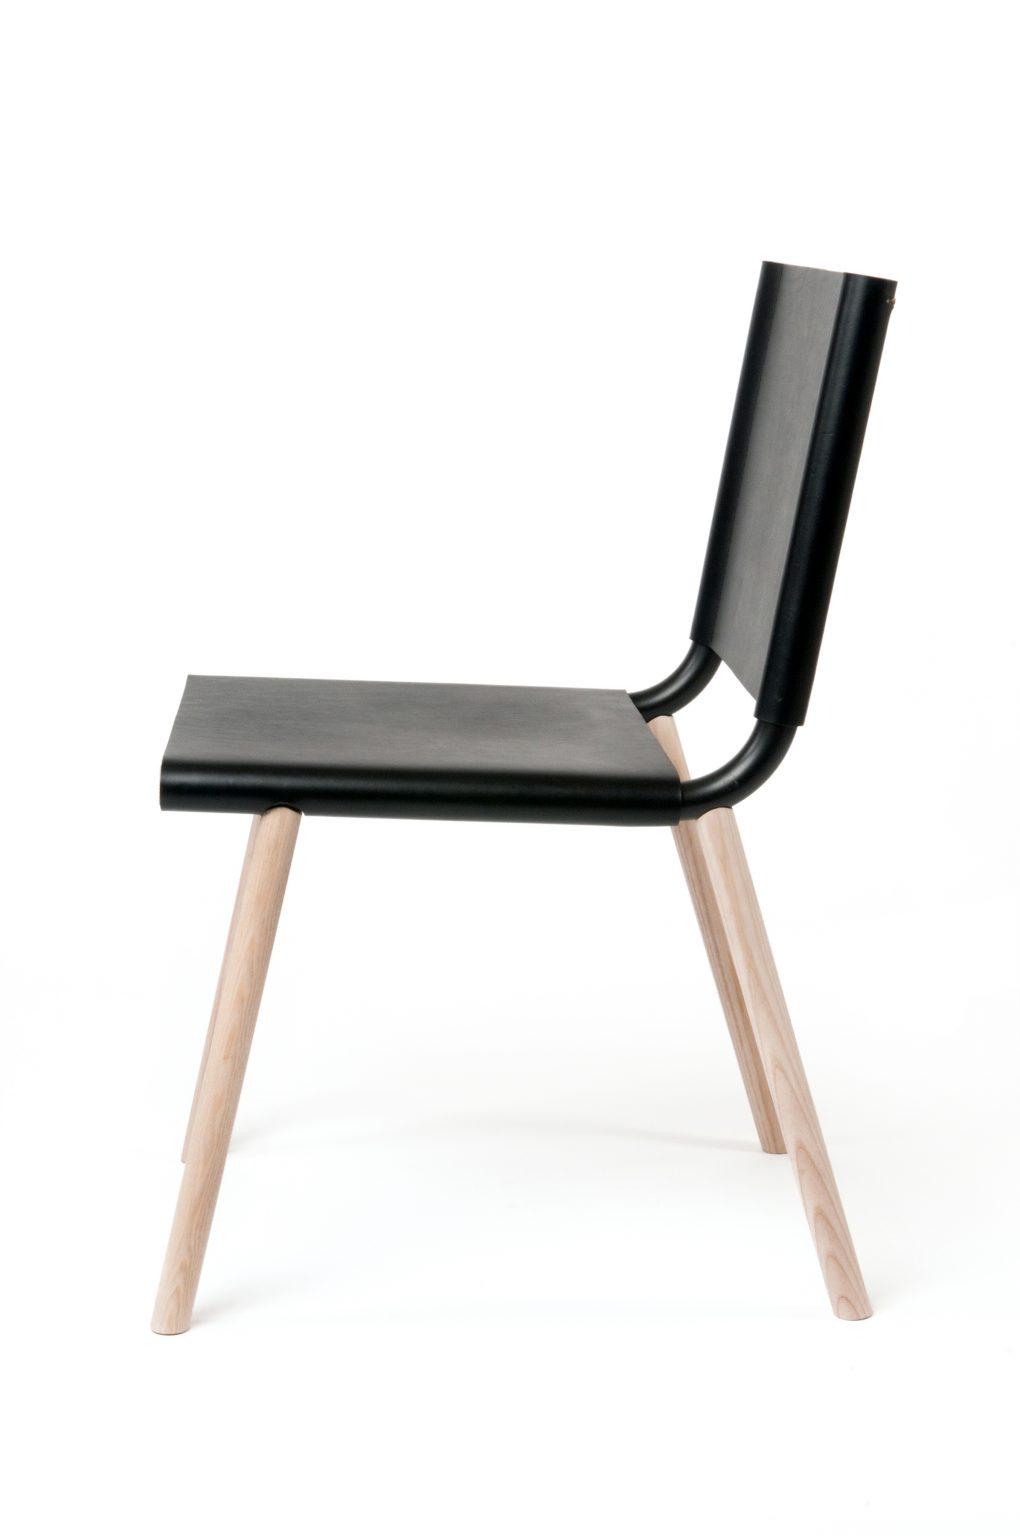 Biennale Interieur - Belgium's leading design and interior event - Goderis-jan_japan-chair_ph-plasschaert-sonny_3-1.jpg